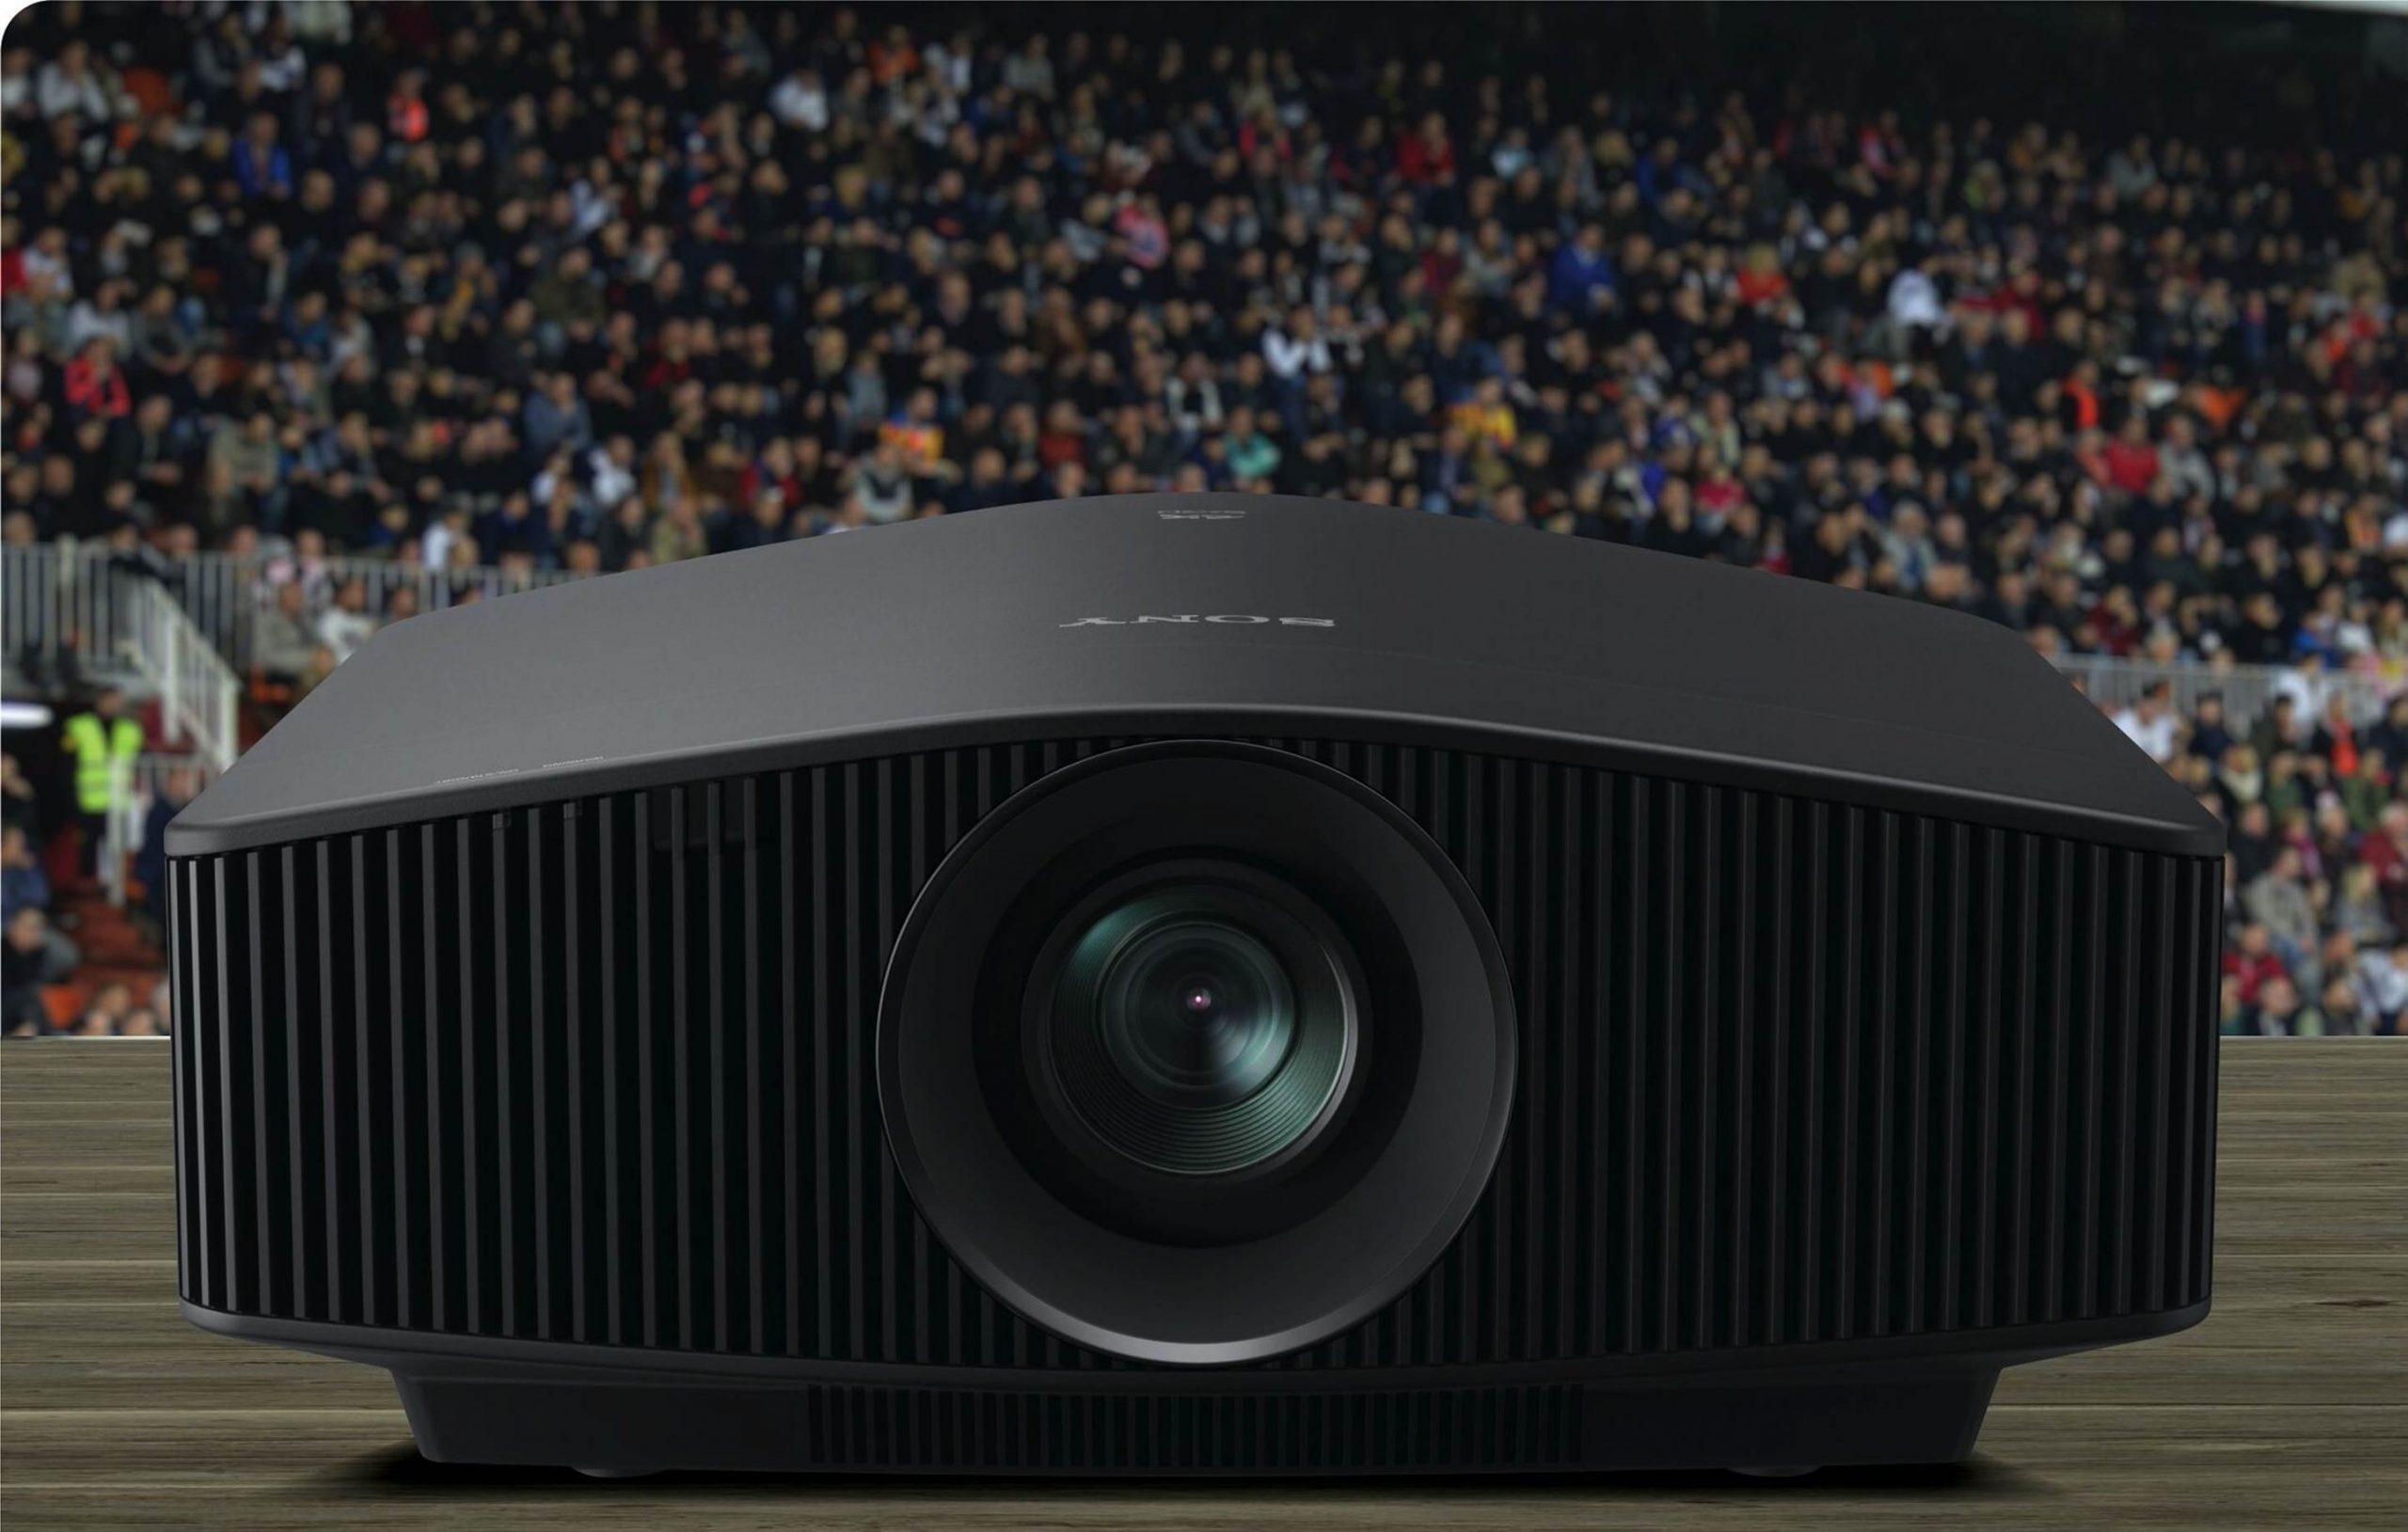 Sony VPL-VW790ES Review